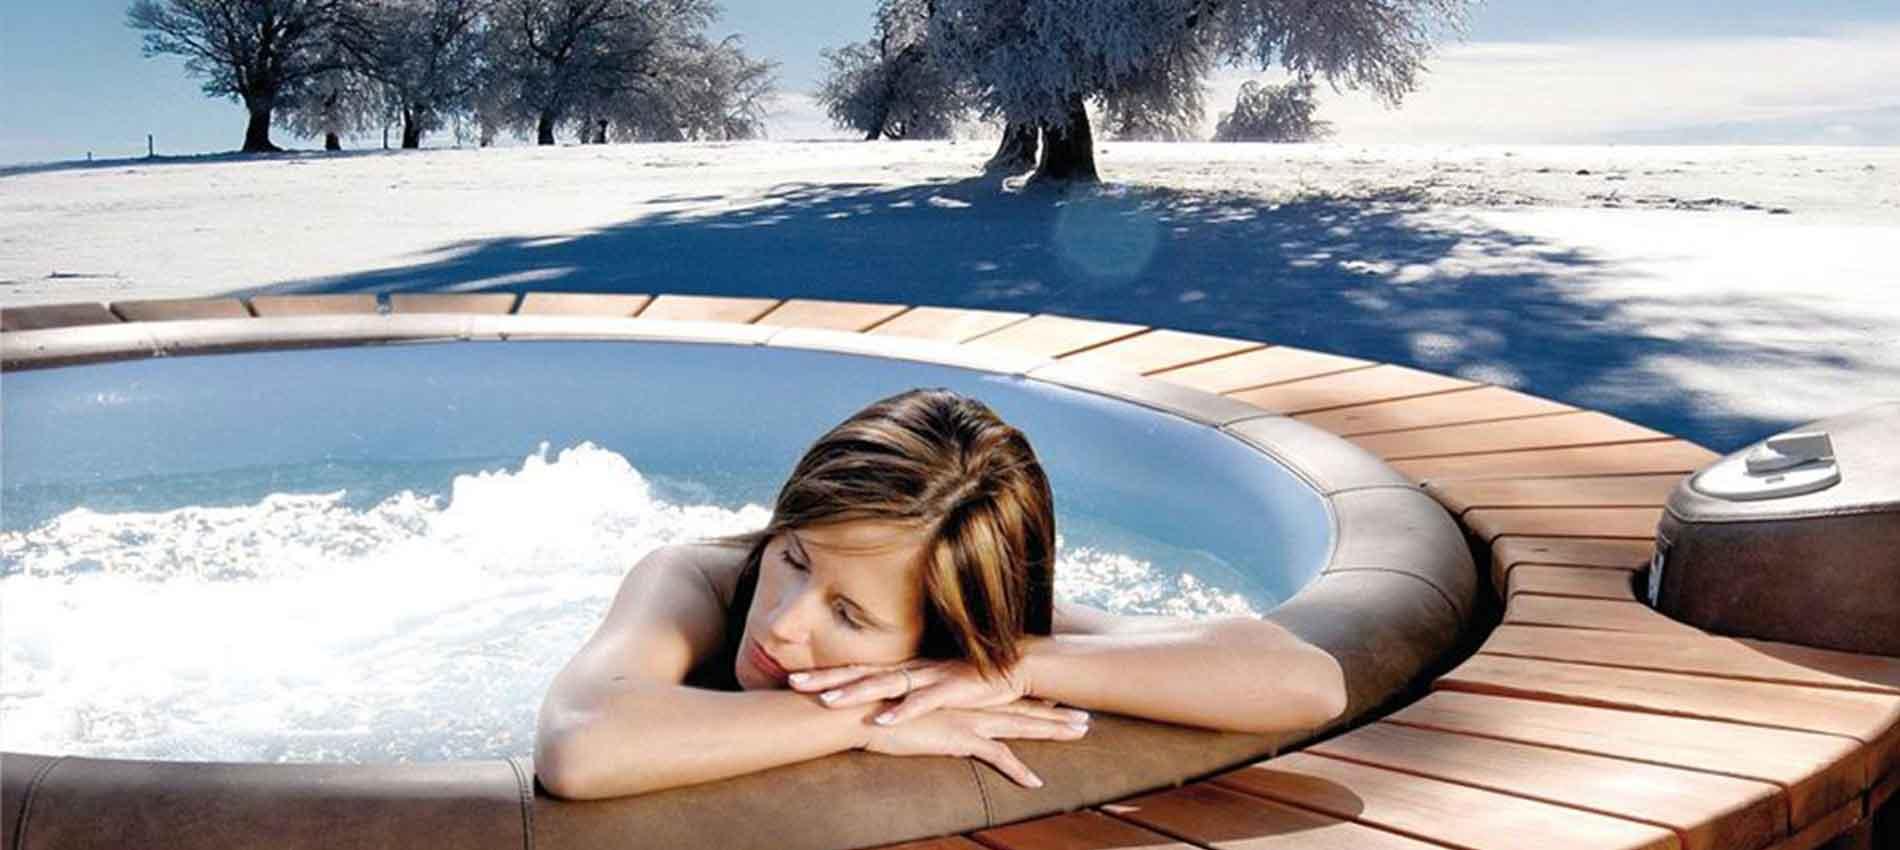 Softub Whirlpool im Schnee